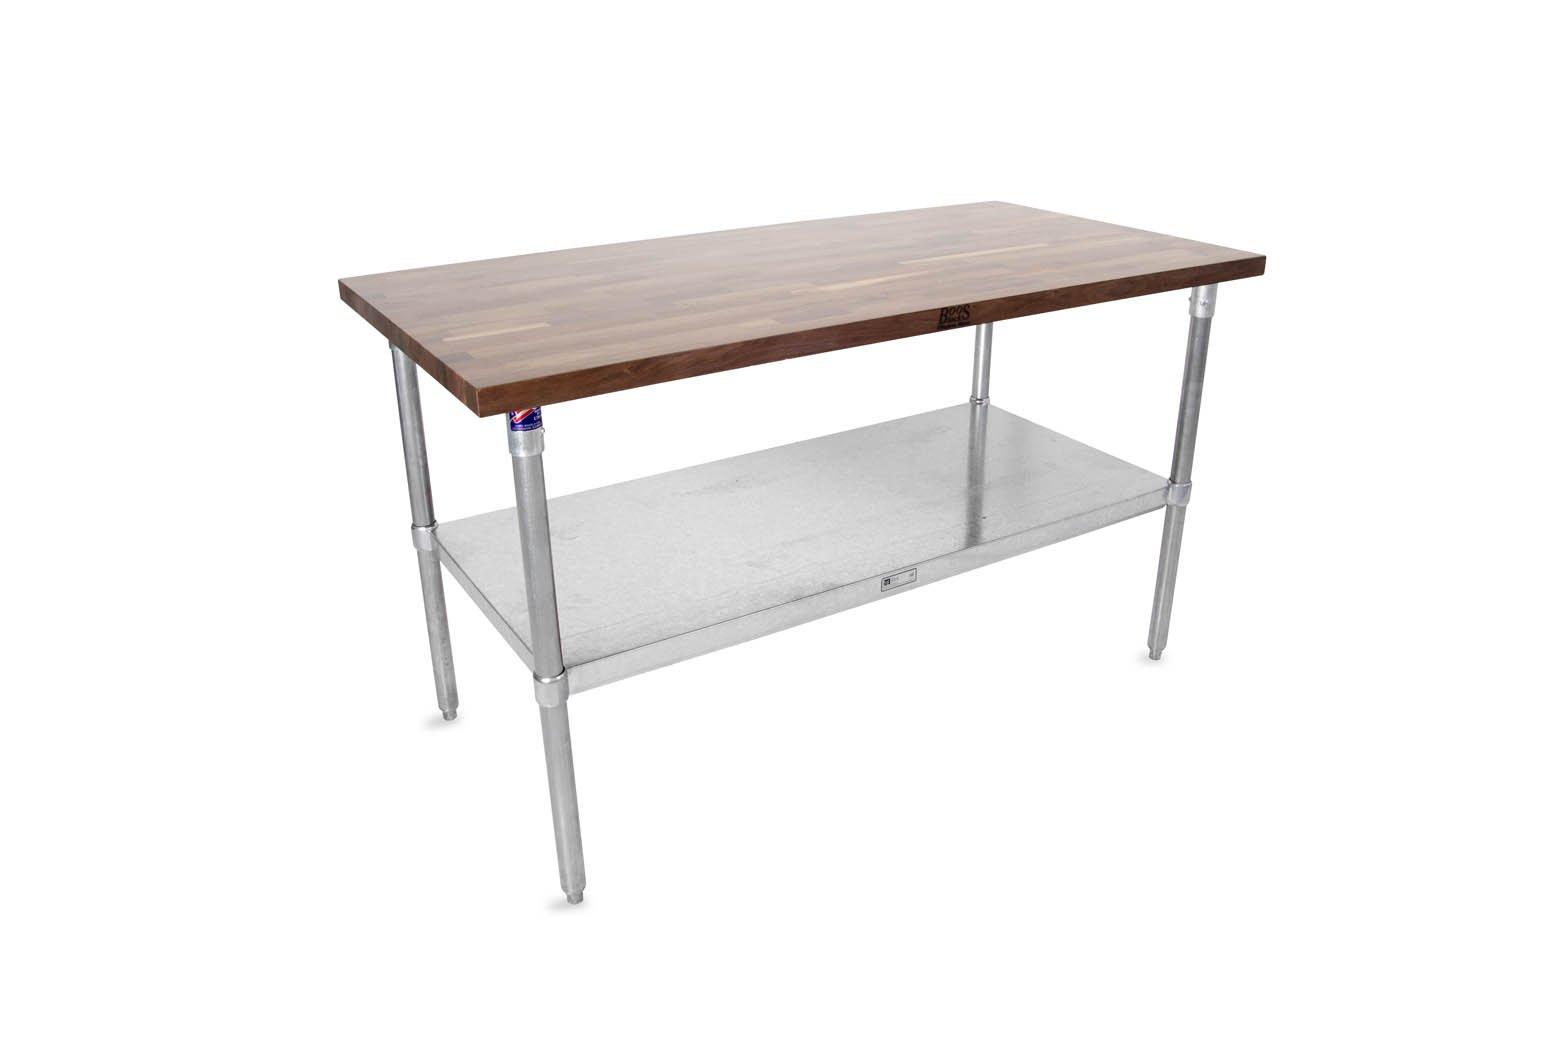 John Boos JNS Series 1-1/2'' Thick Walnut Wood Top Work Tables